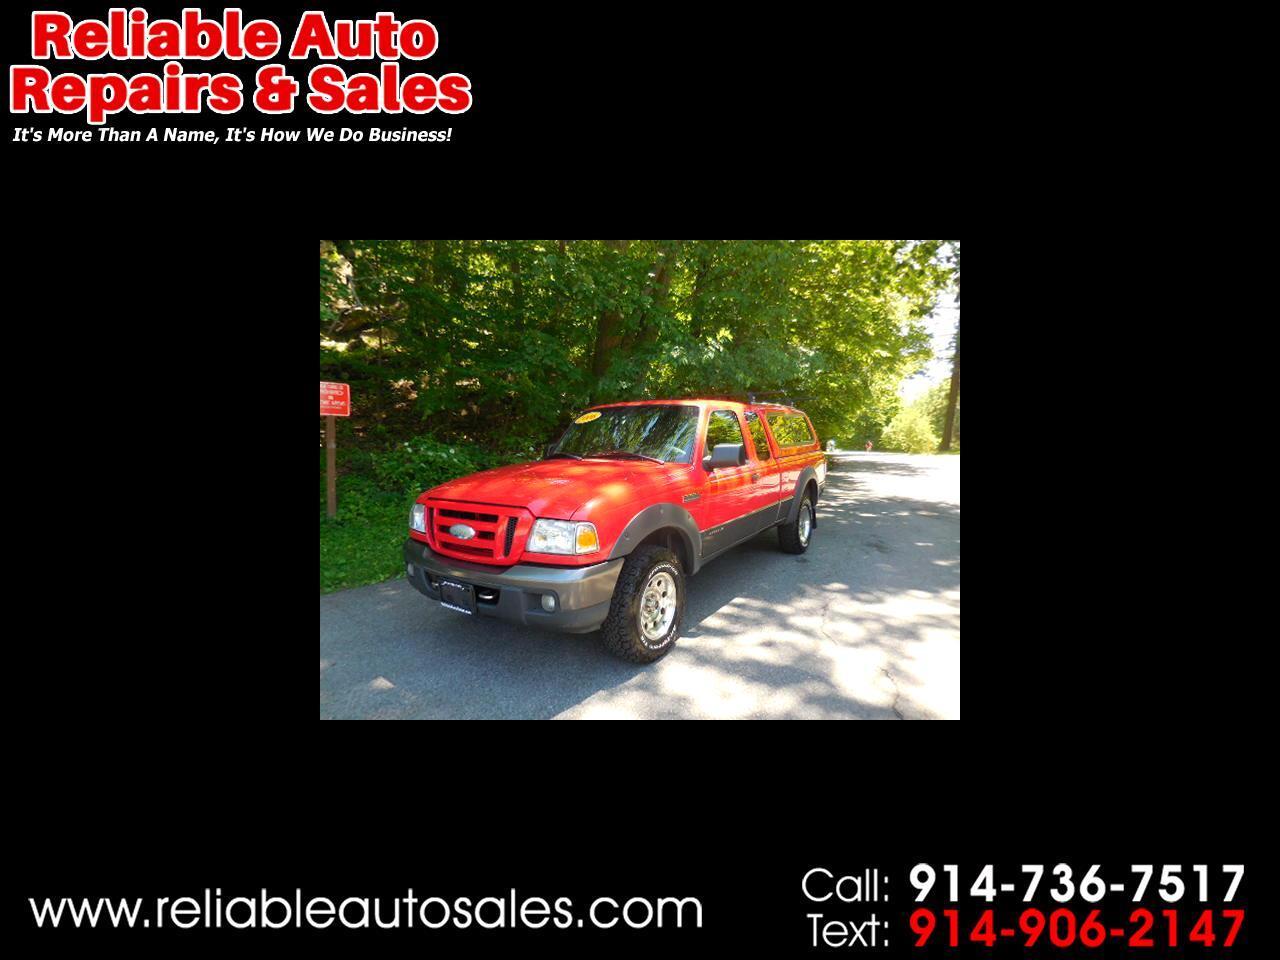 2006 Ford Ranger FX4 Off-Road SuperCab 4-Door 4WD